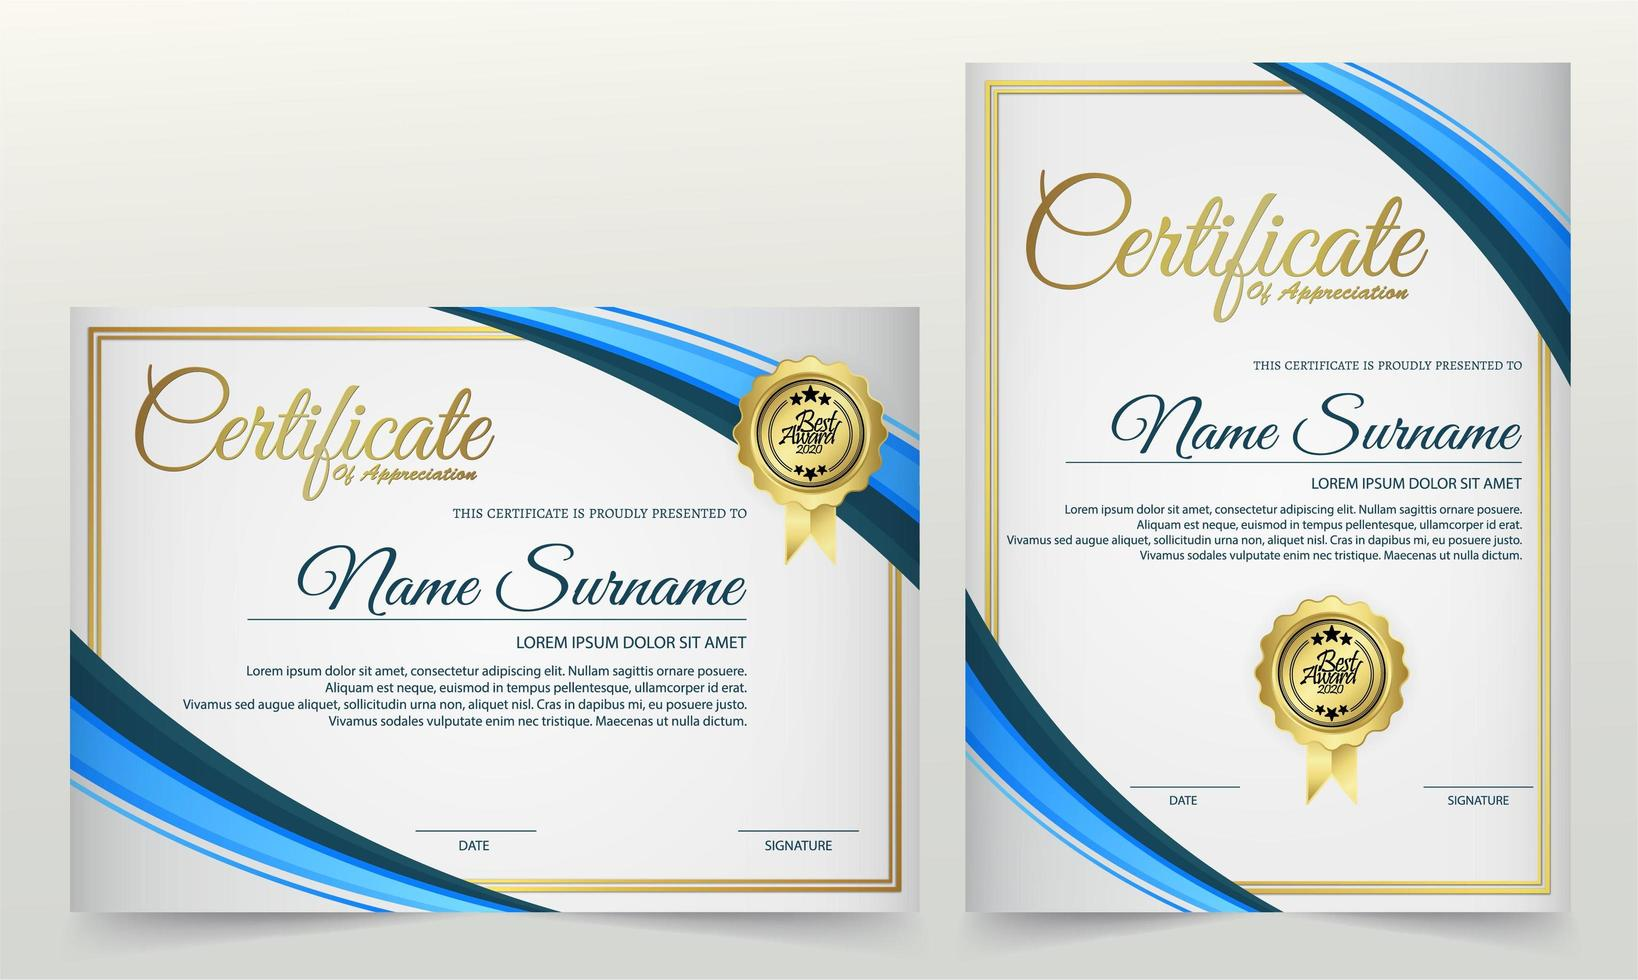 certificat horizontal et vertical en blanc et bleu vecteur